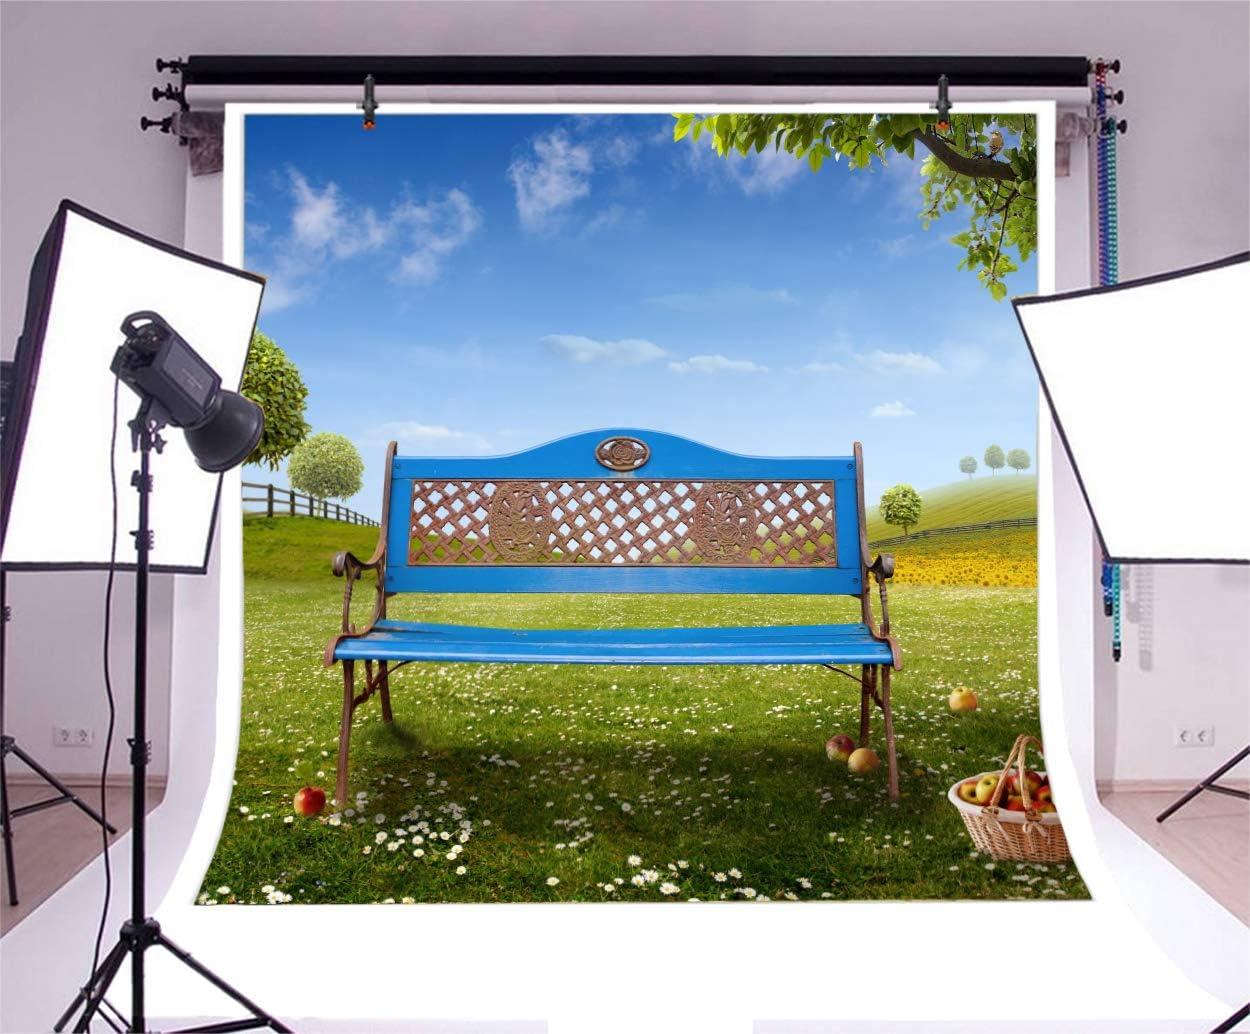 YongFoto 6.5x6.5ft Spring Grassland Backdrop Bench Tree Apple Basket Photography Background Blue Sky White Cloud Outdoor Idyllic Scenery Park Picnic Leisure Kids Adult Portrait Studio Props Wallpaper